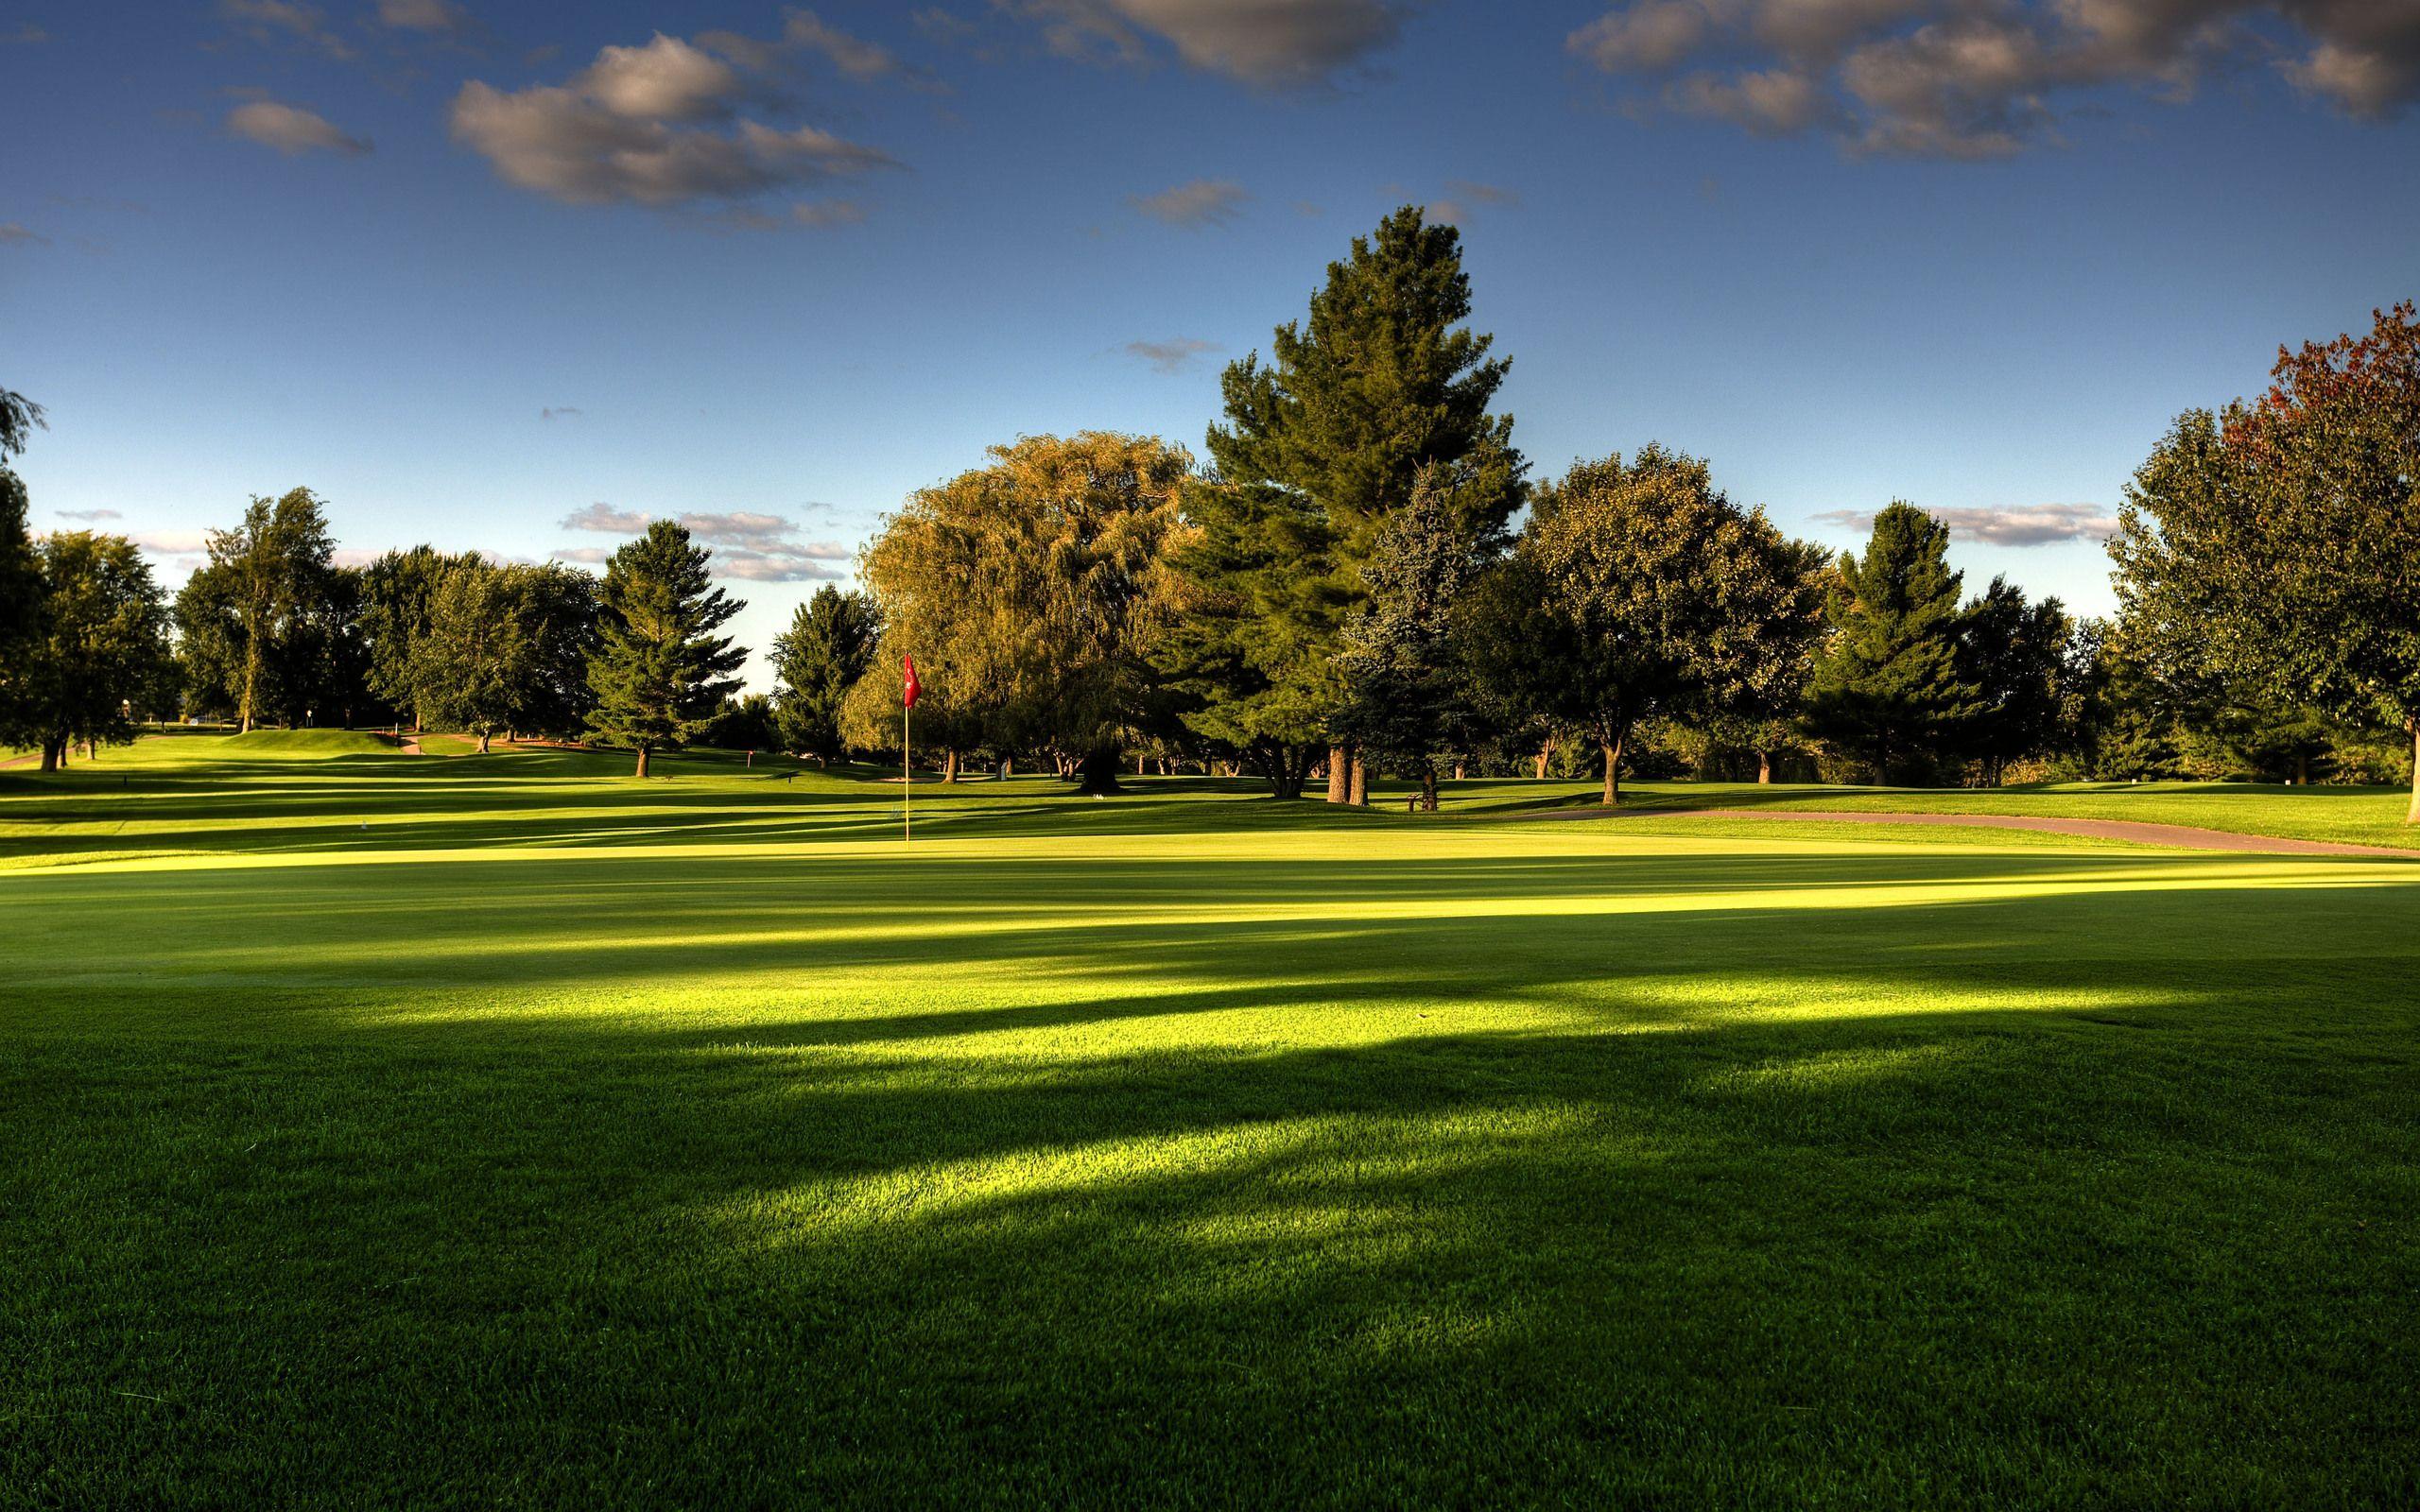 Free Scenic Desktop Wallpaper Golf bilder, Bilder